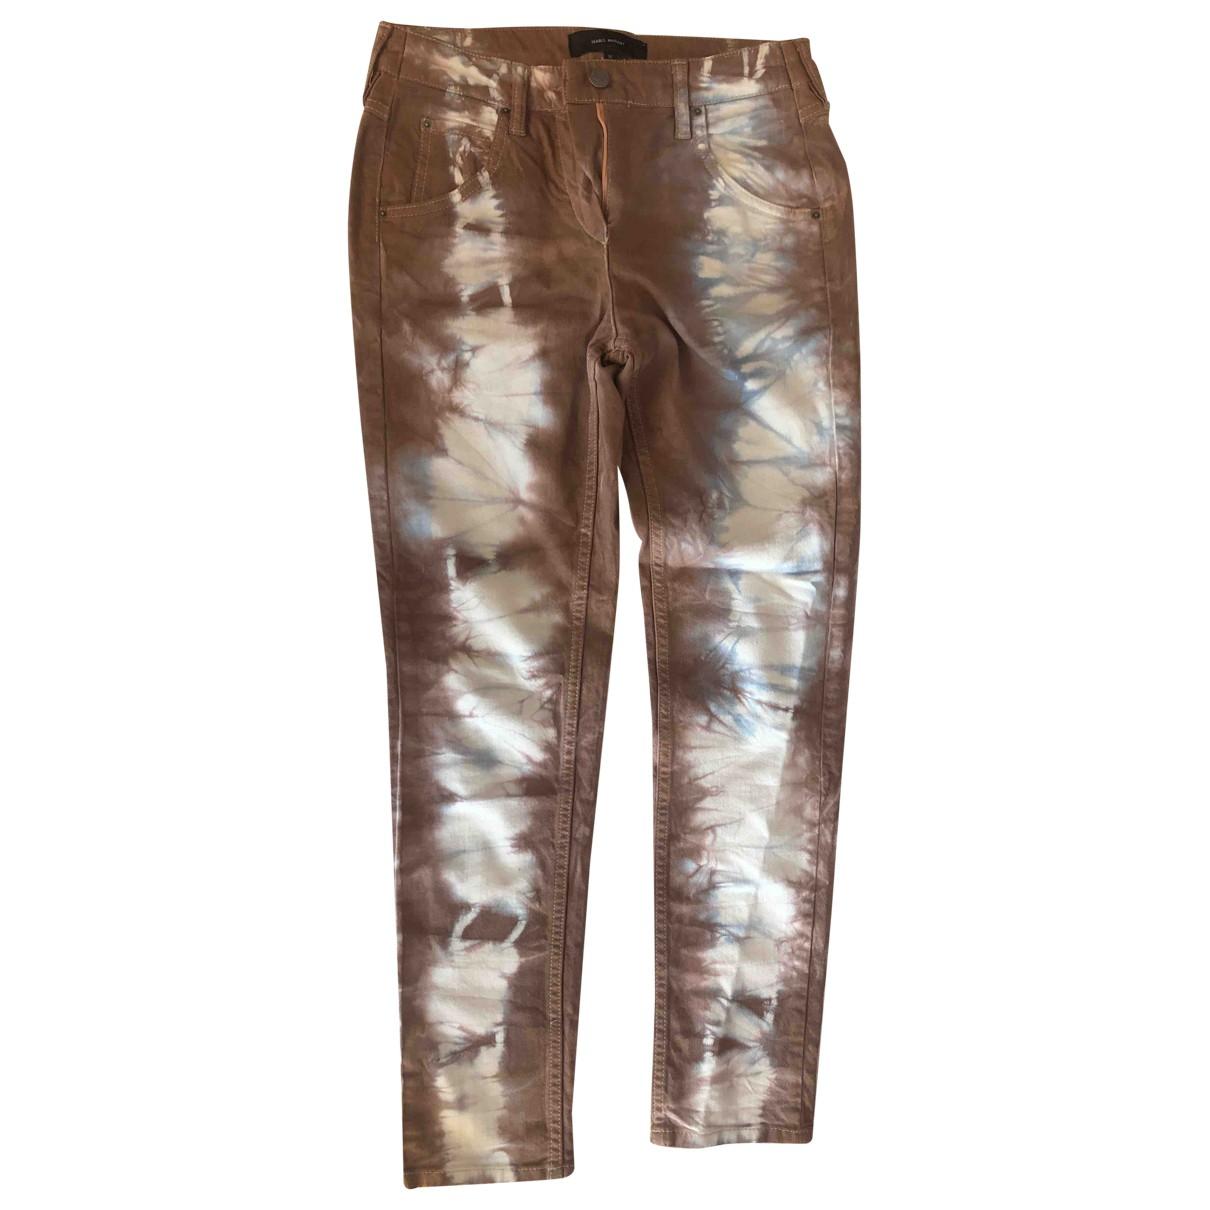 Isabel Marant \N Cotton - elasthane Jeans for Women 36 FR